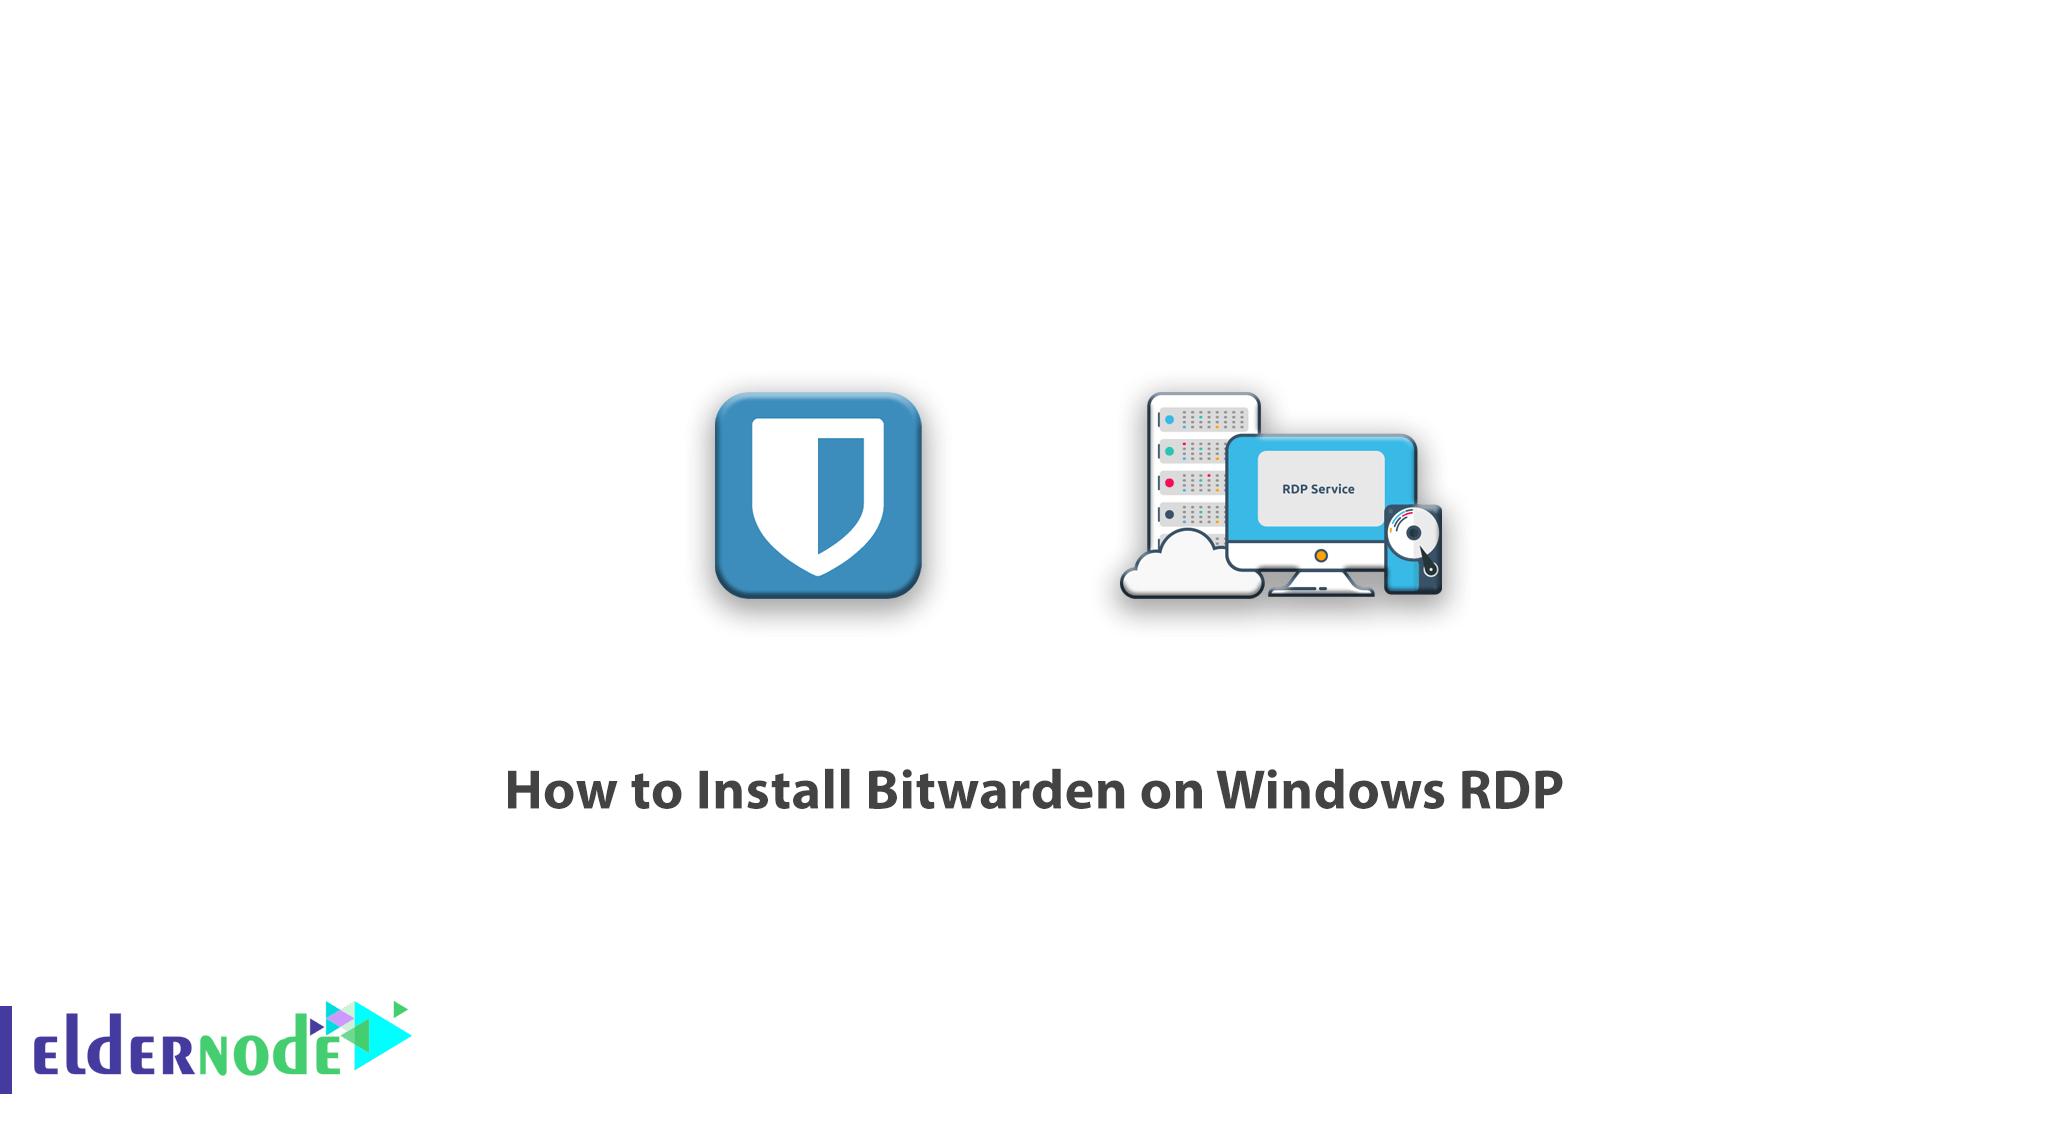 How to Install Bitwarden on Windows RDP